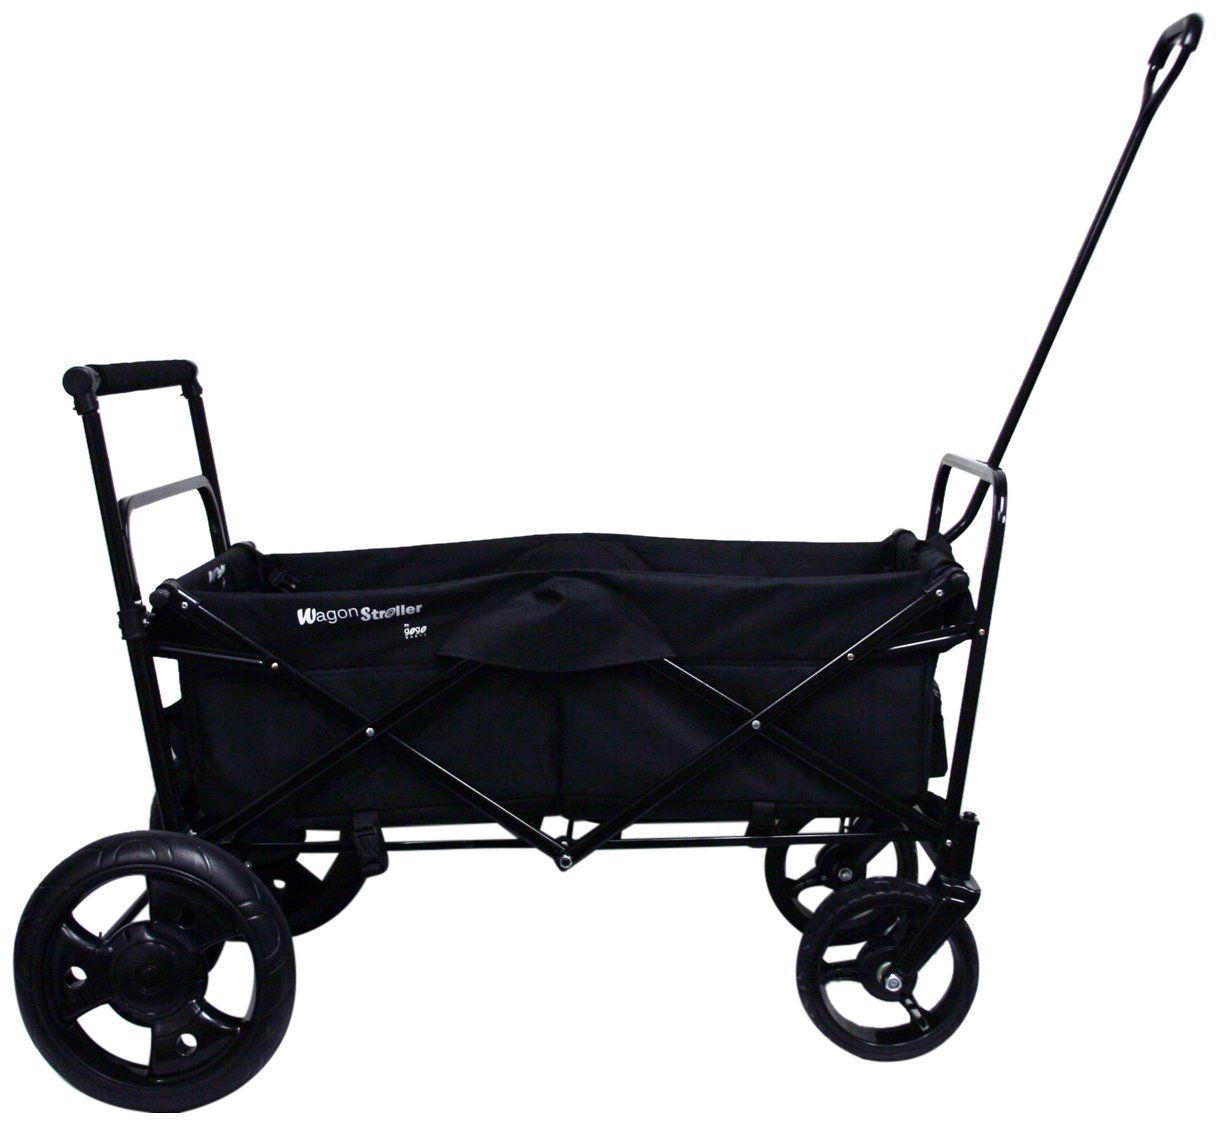 Baby Trend Double Wagon Stroller - Stroller